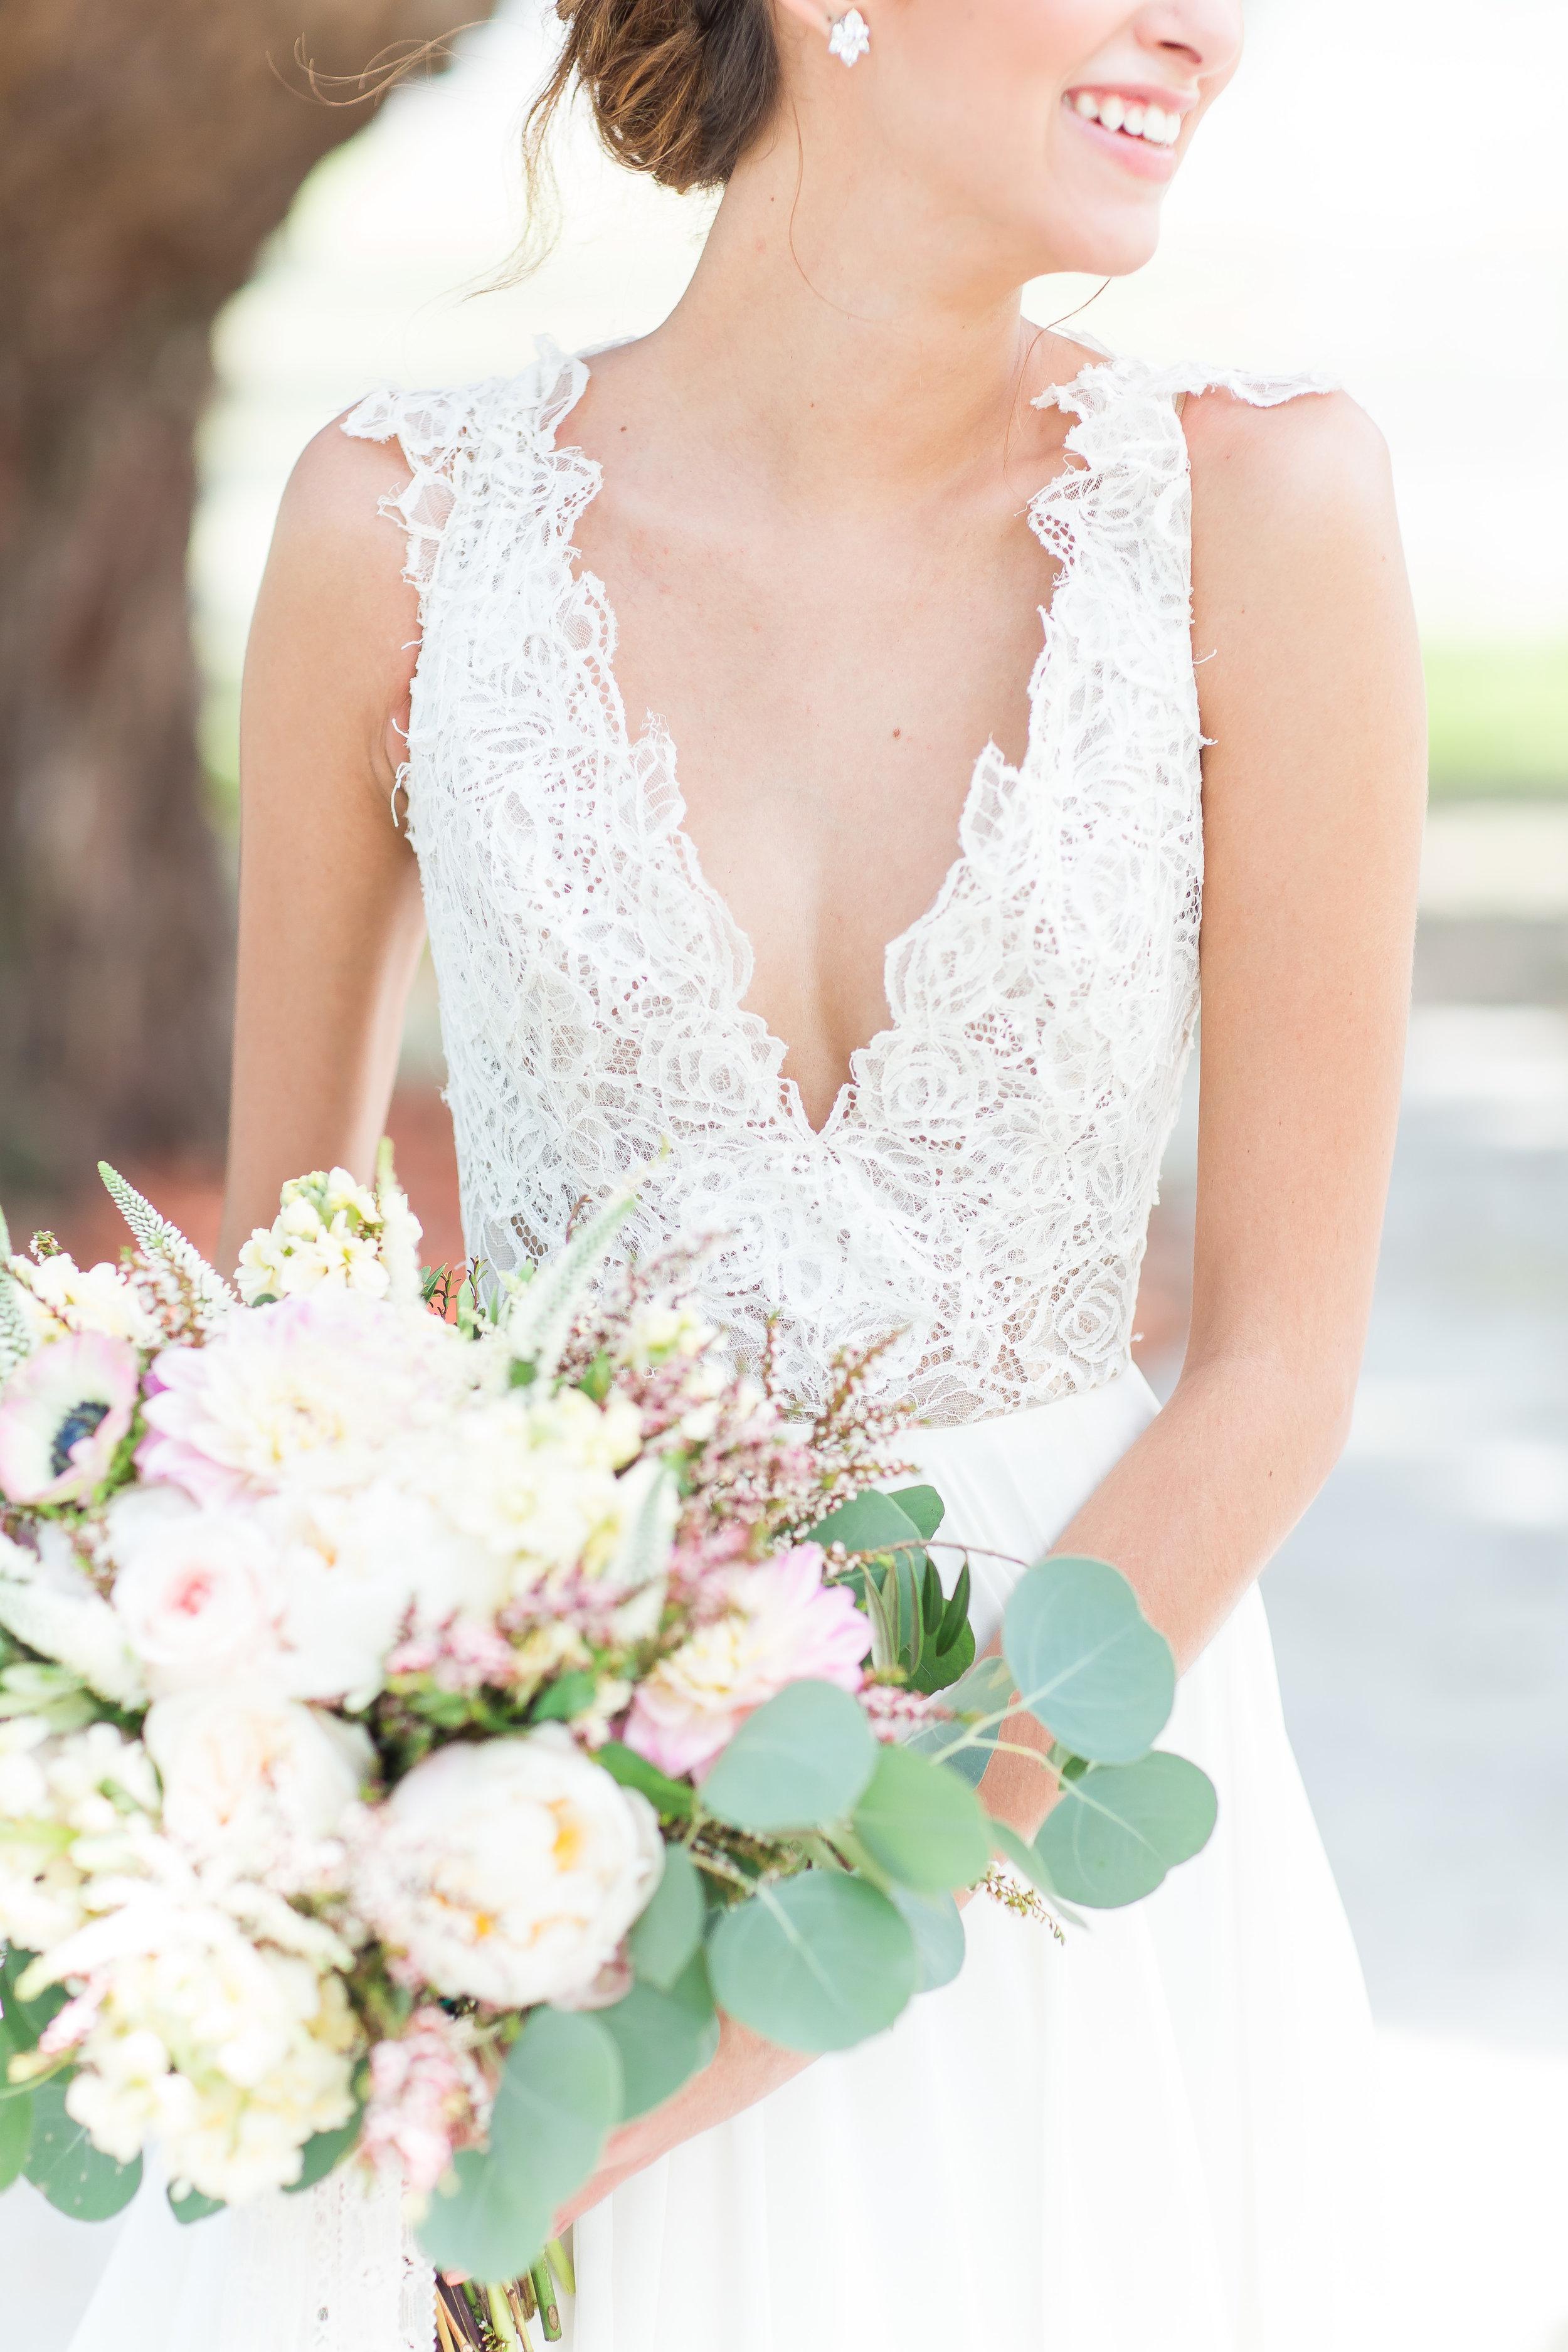 PSJ Photography by PJ Saffran - Central Florida wedding photographer - DeLand - Winter Park - Tampa - St Augustine - Palm Beach at Highland Manor Wedding